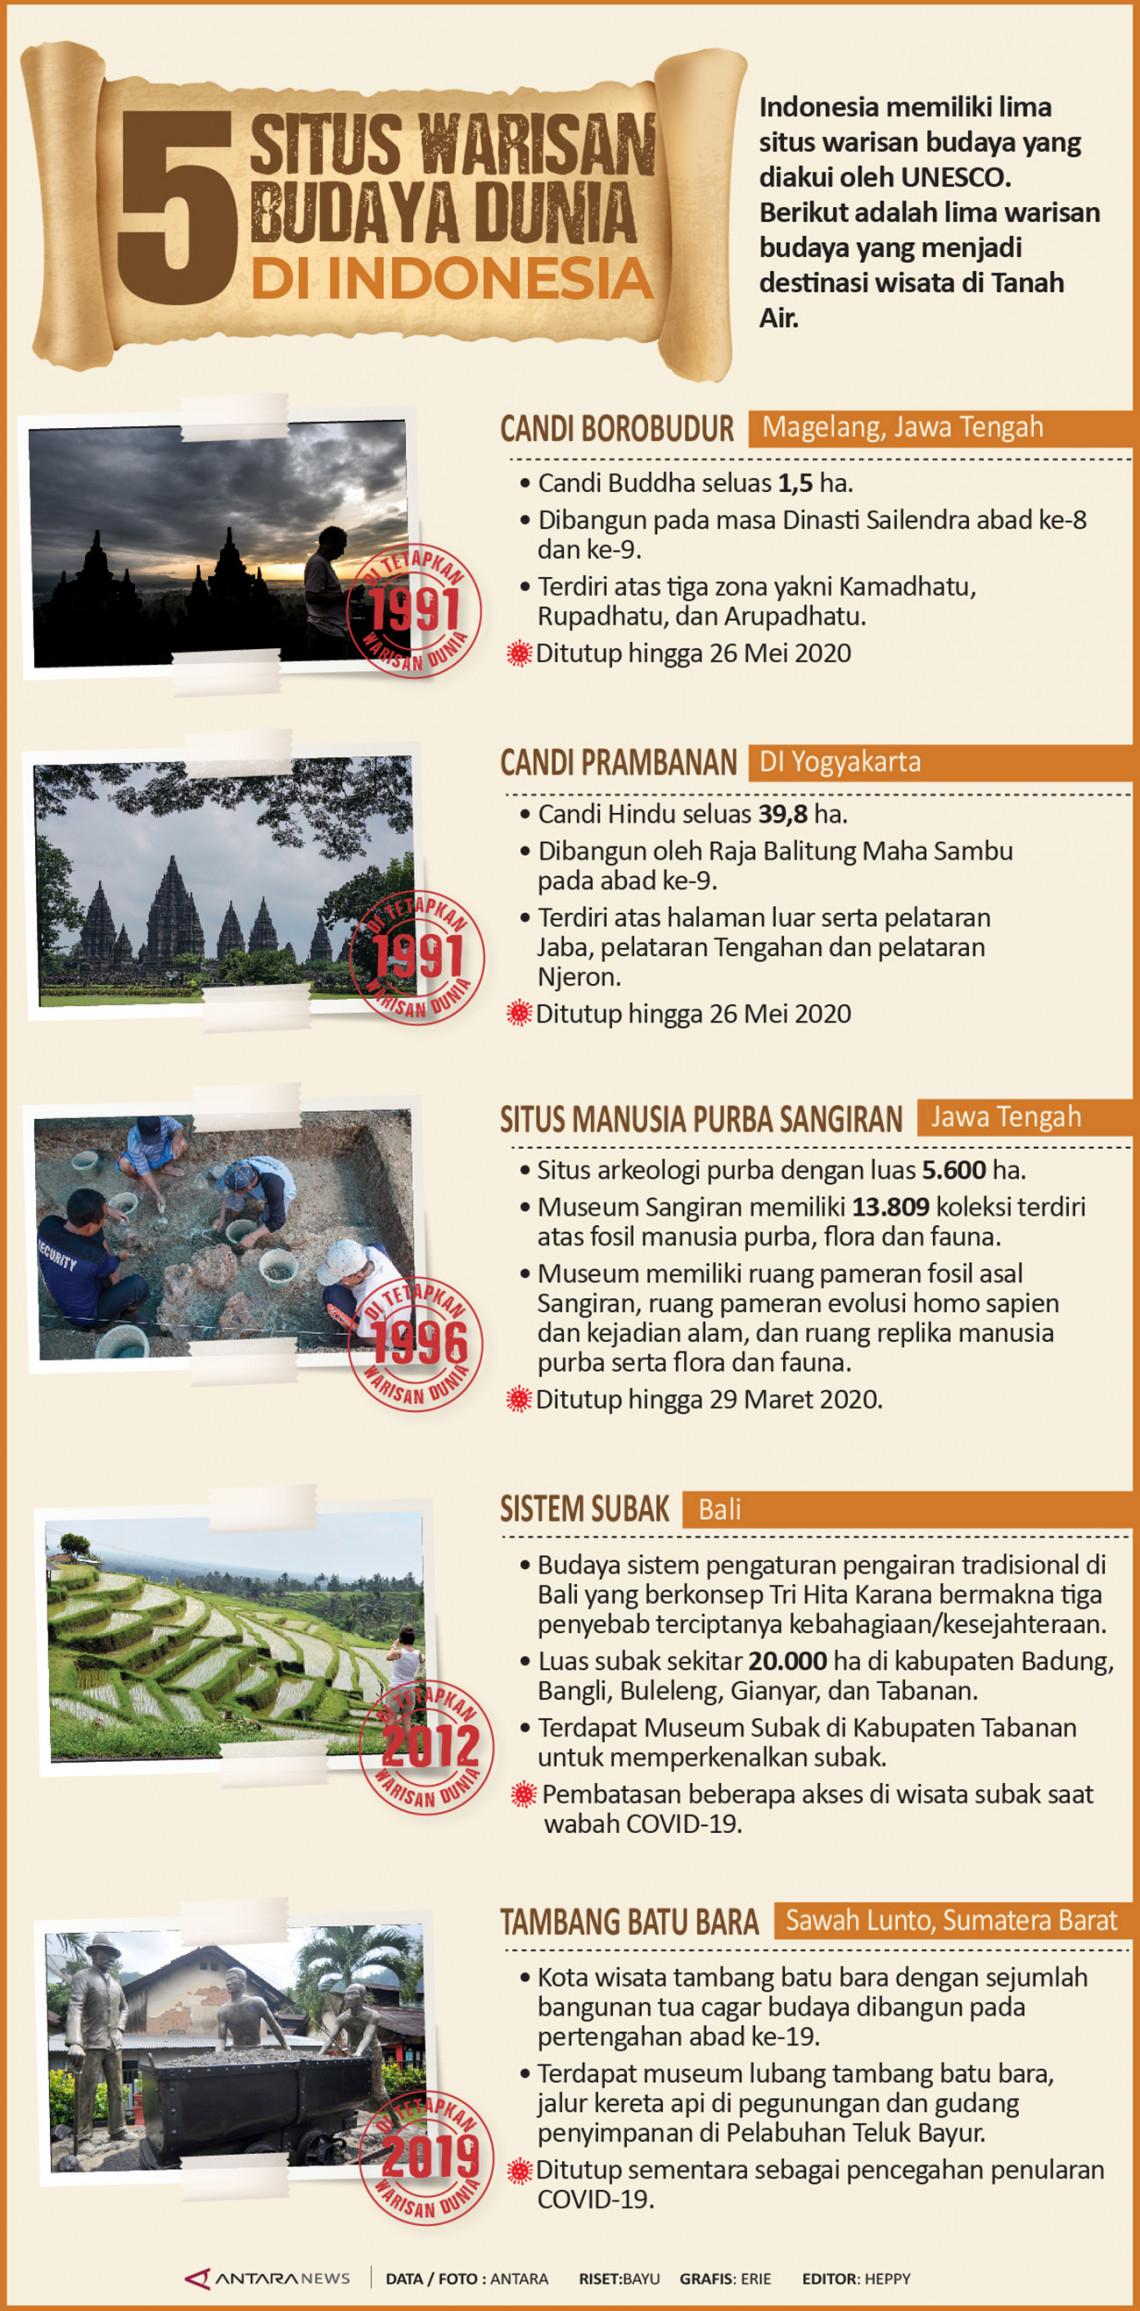 Lima situs warisan budaya dunia di Indonesia